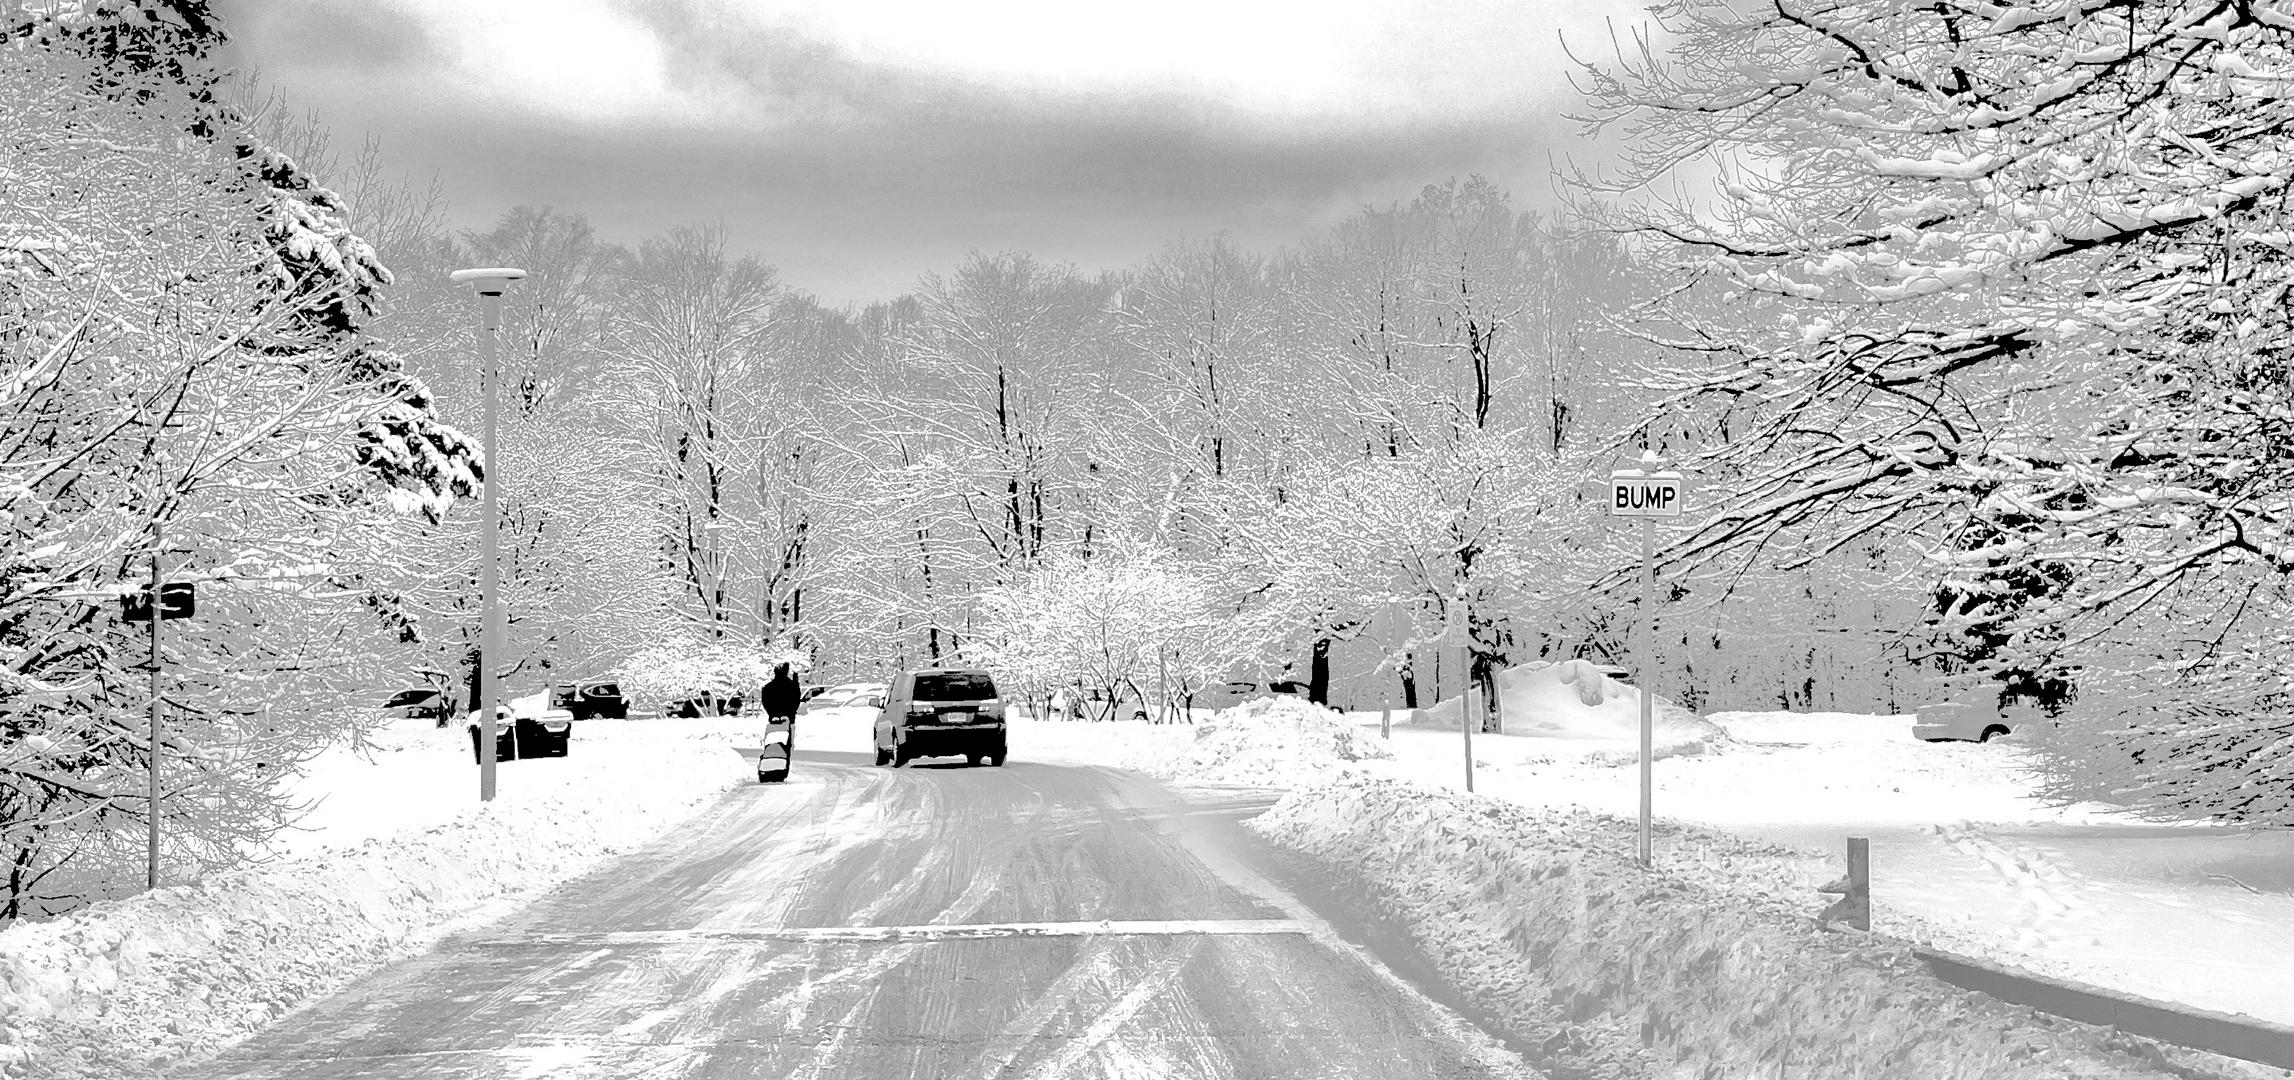 SNOW WHITE CINERAMA